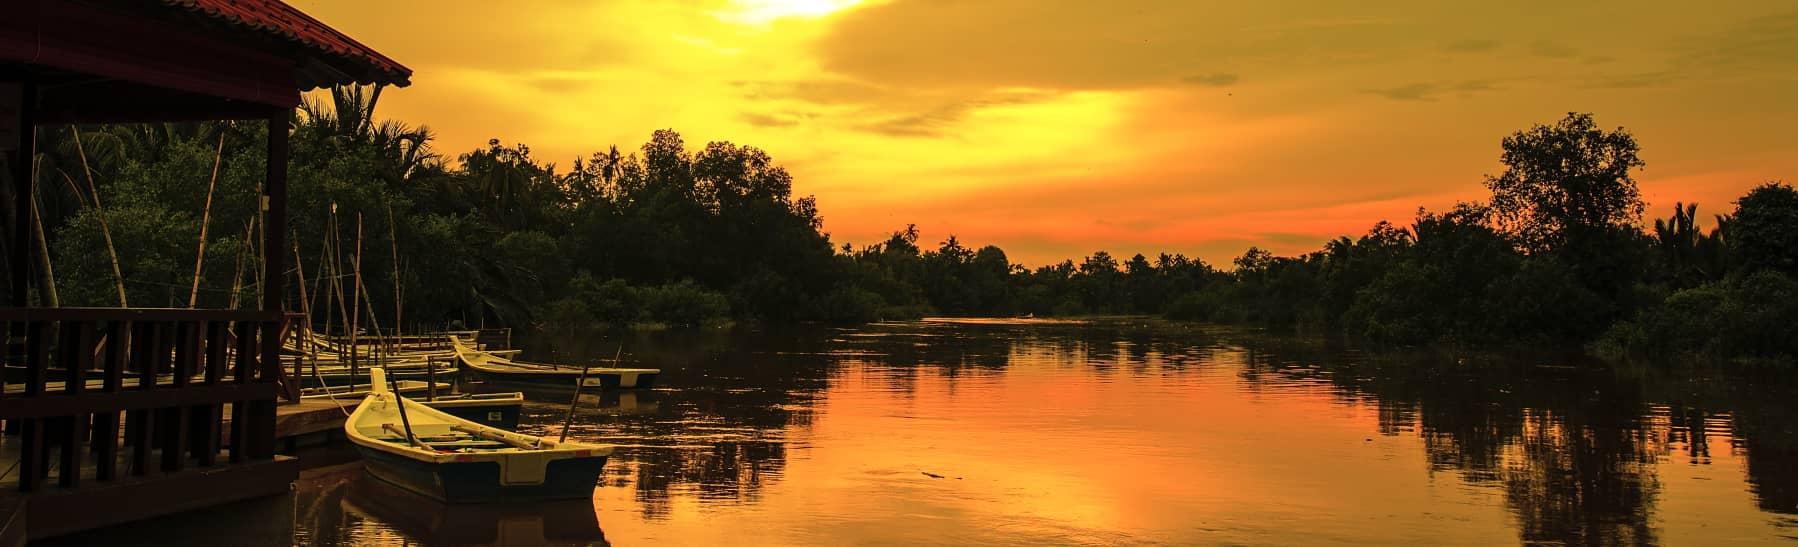 Iwahig Firefly Watching & River Cruise Puerto Princesa Tour – Evening  gallery